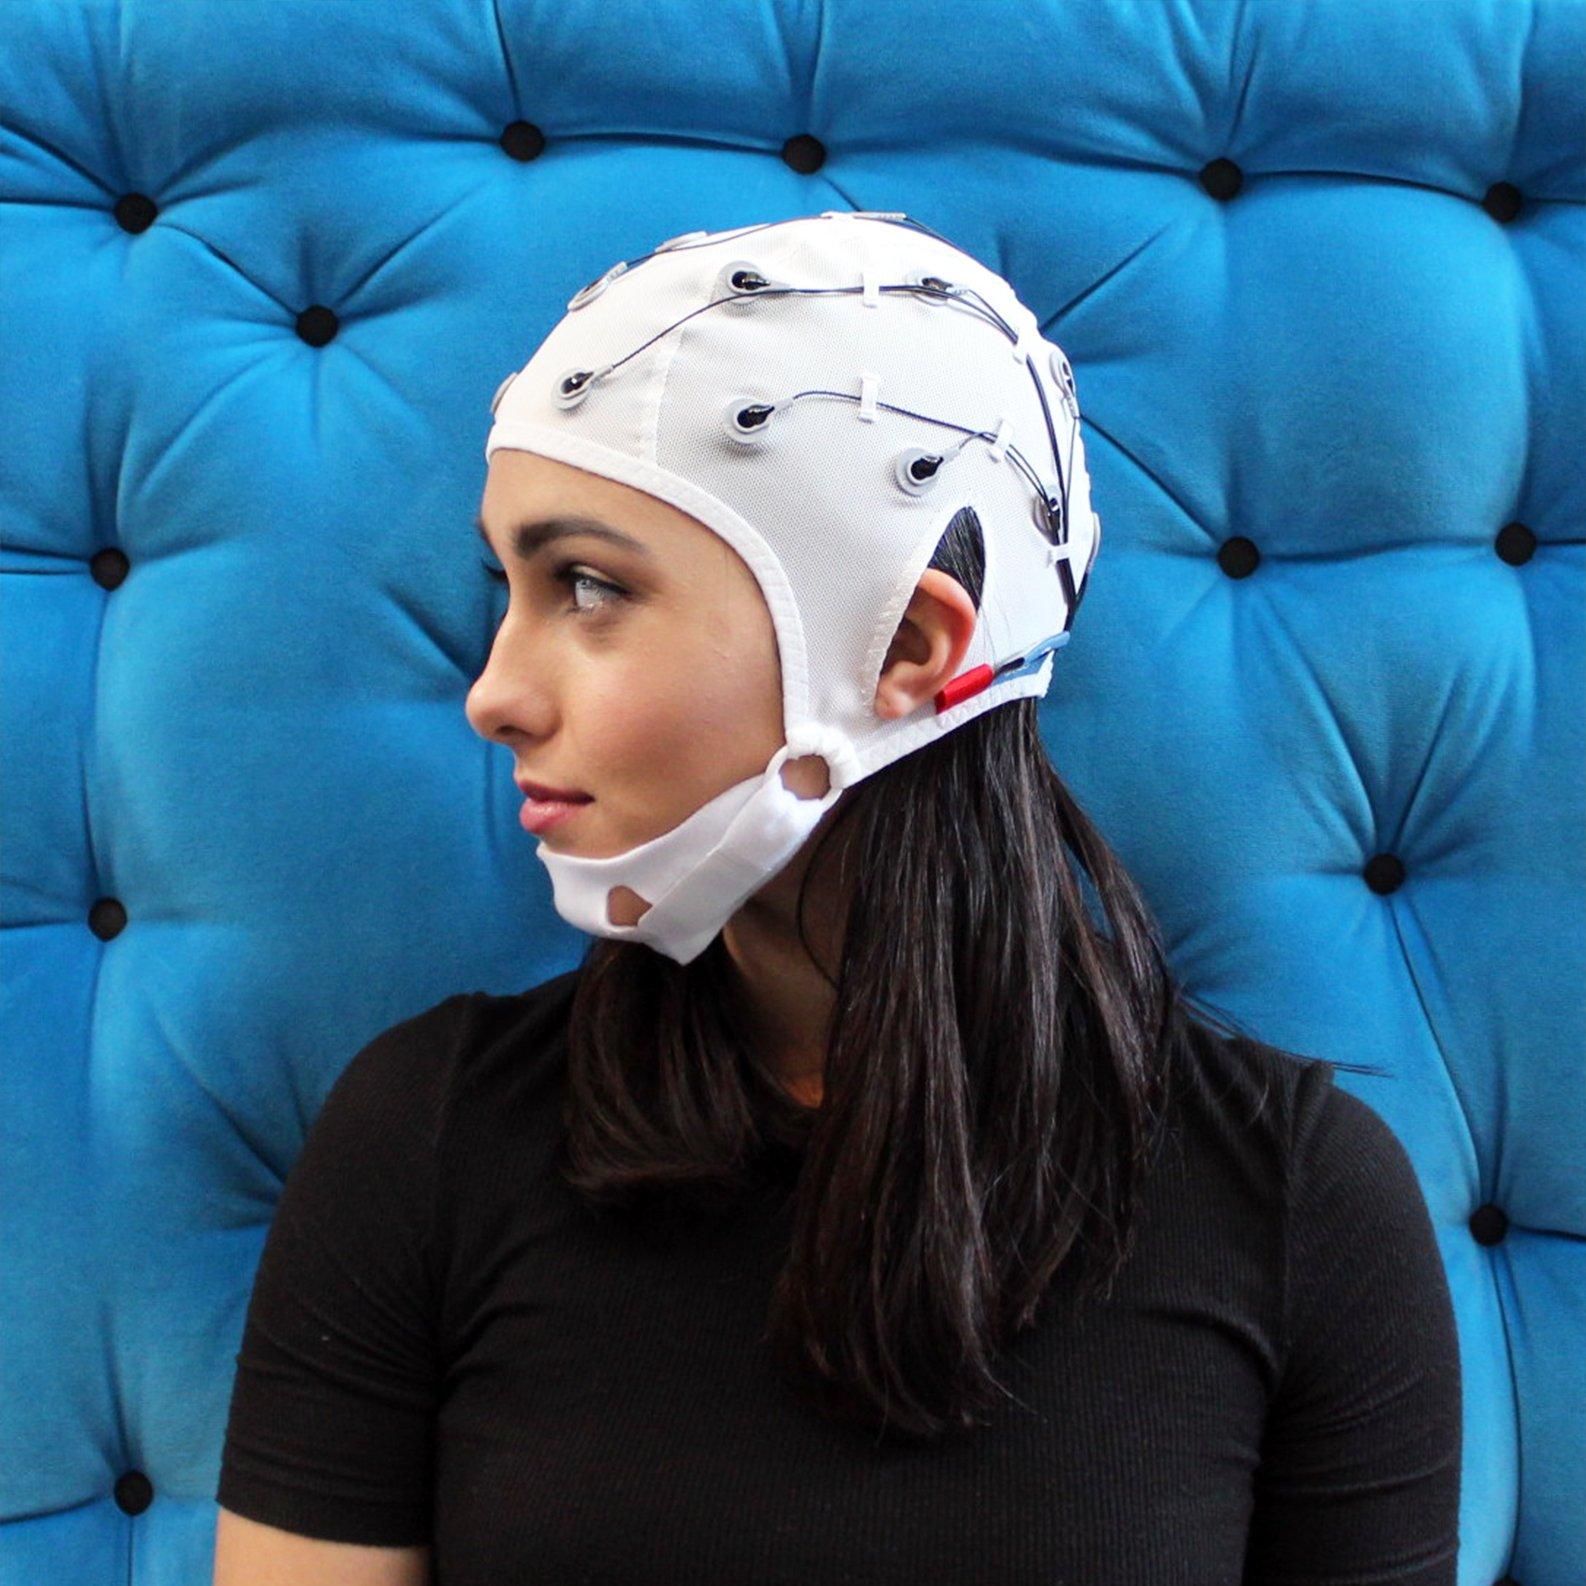 EEG Electrode Coated Cap Kit - Small